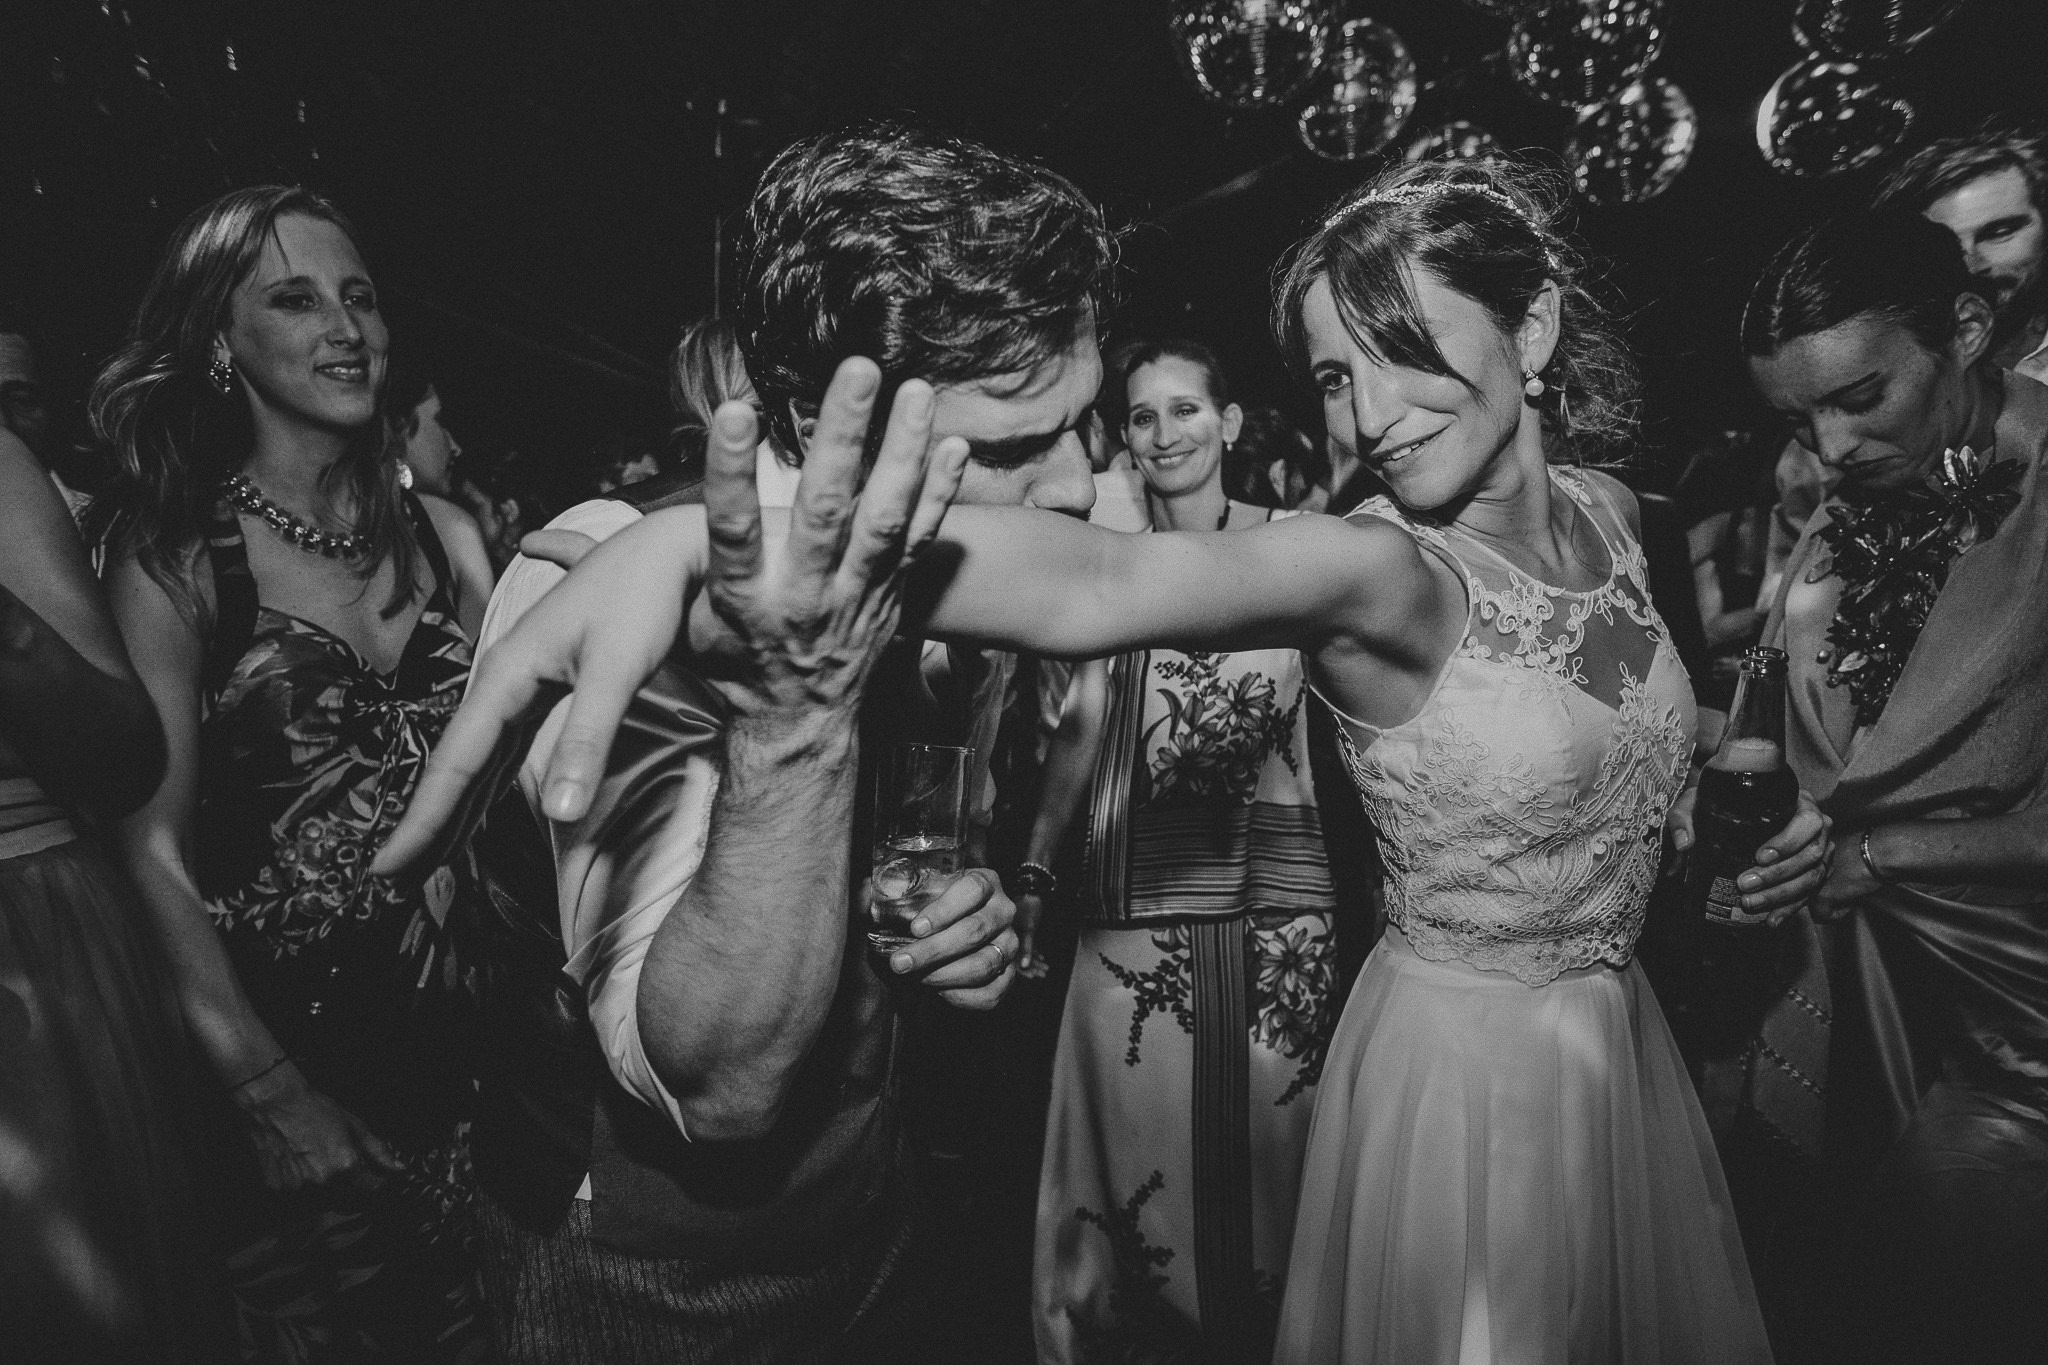 boda en lacrosse - fotografía espontánea de bodas - fotos de boda uruguay - P&I08